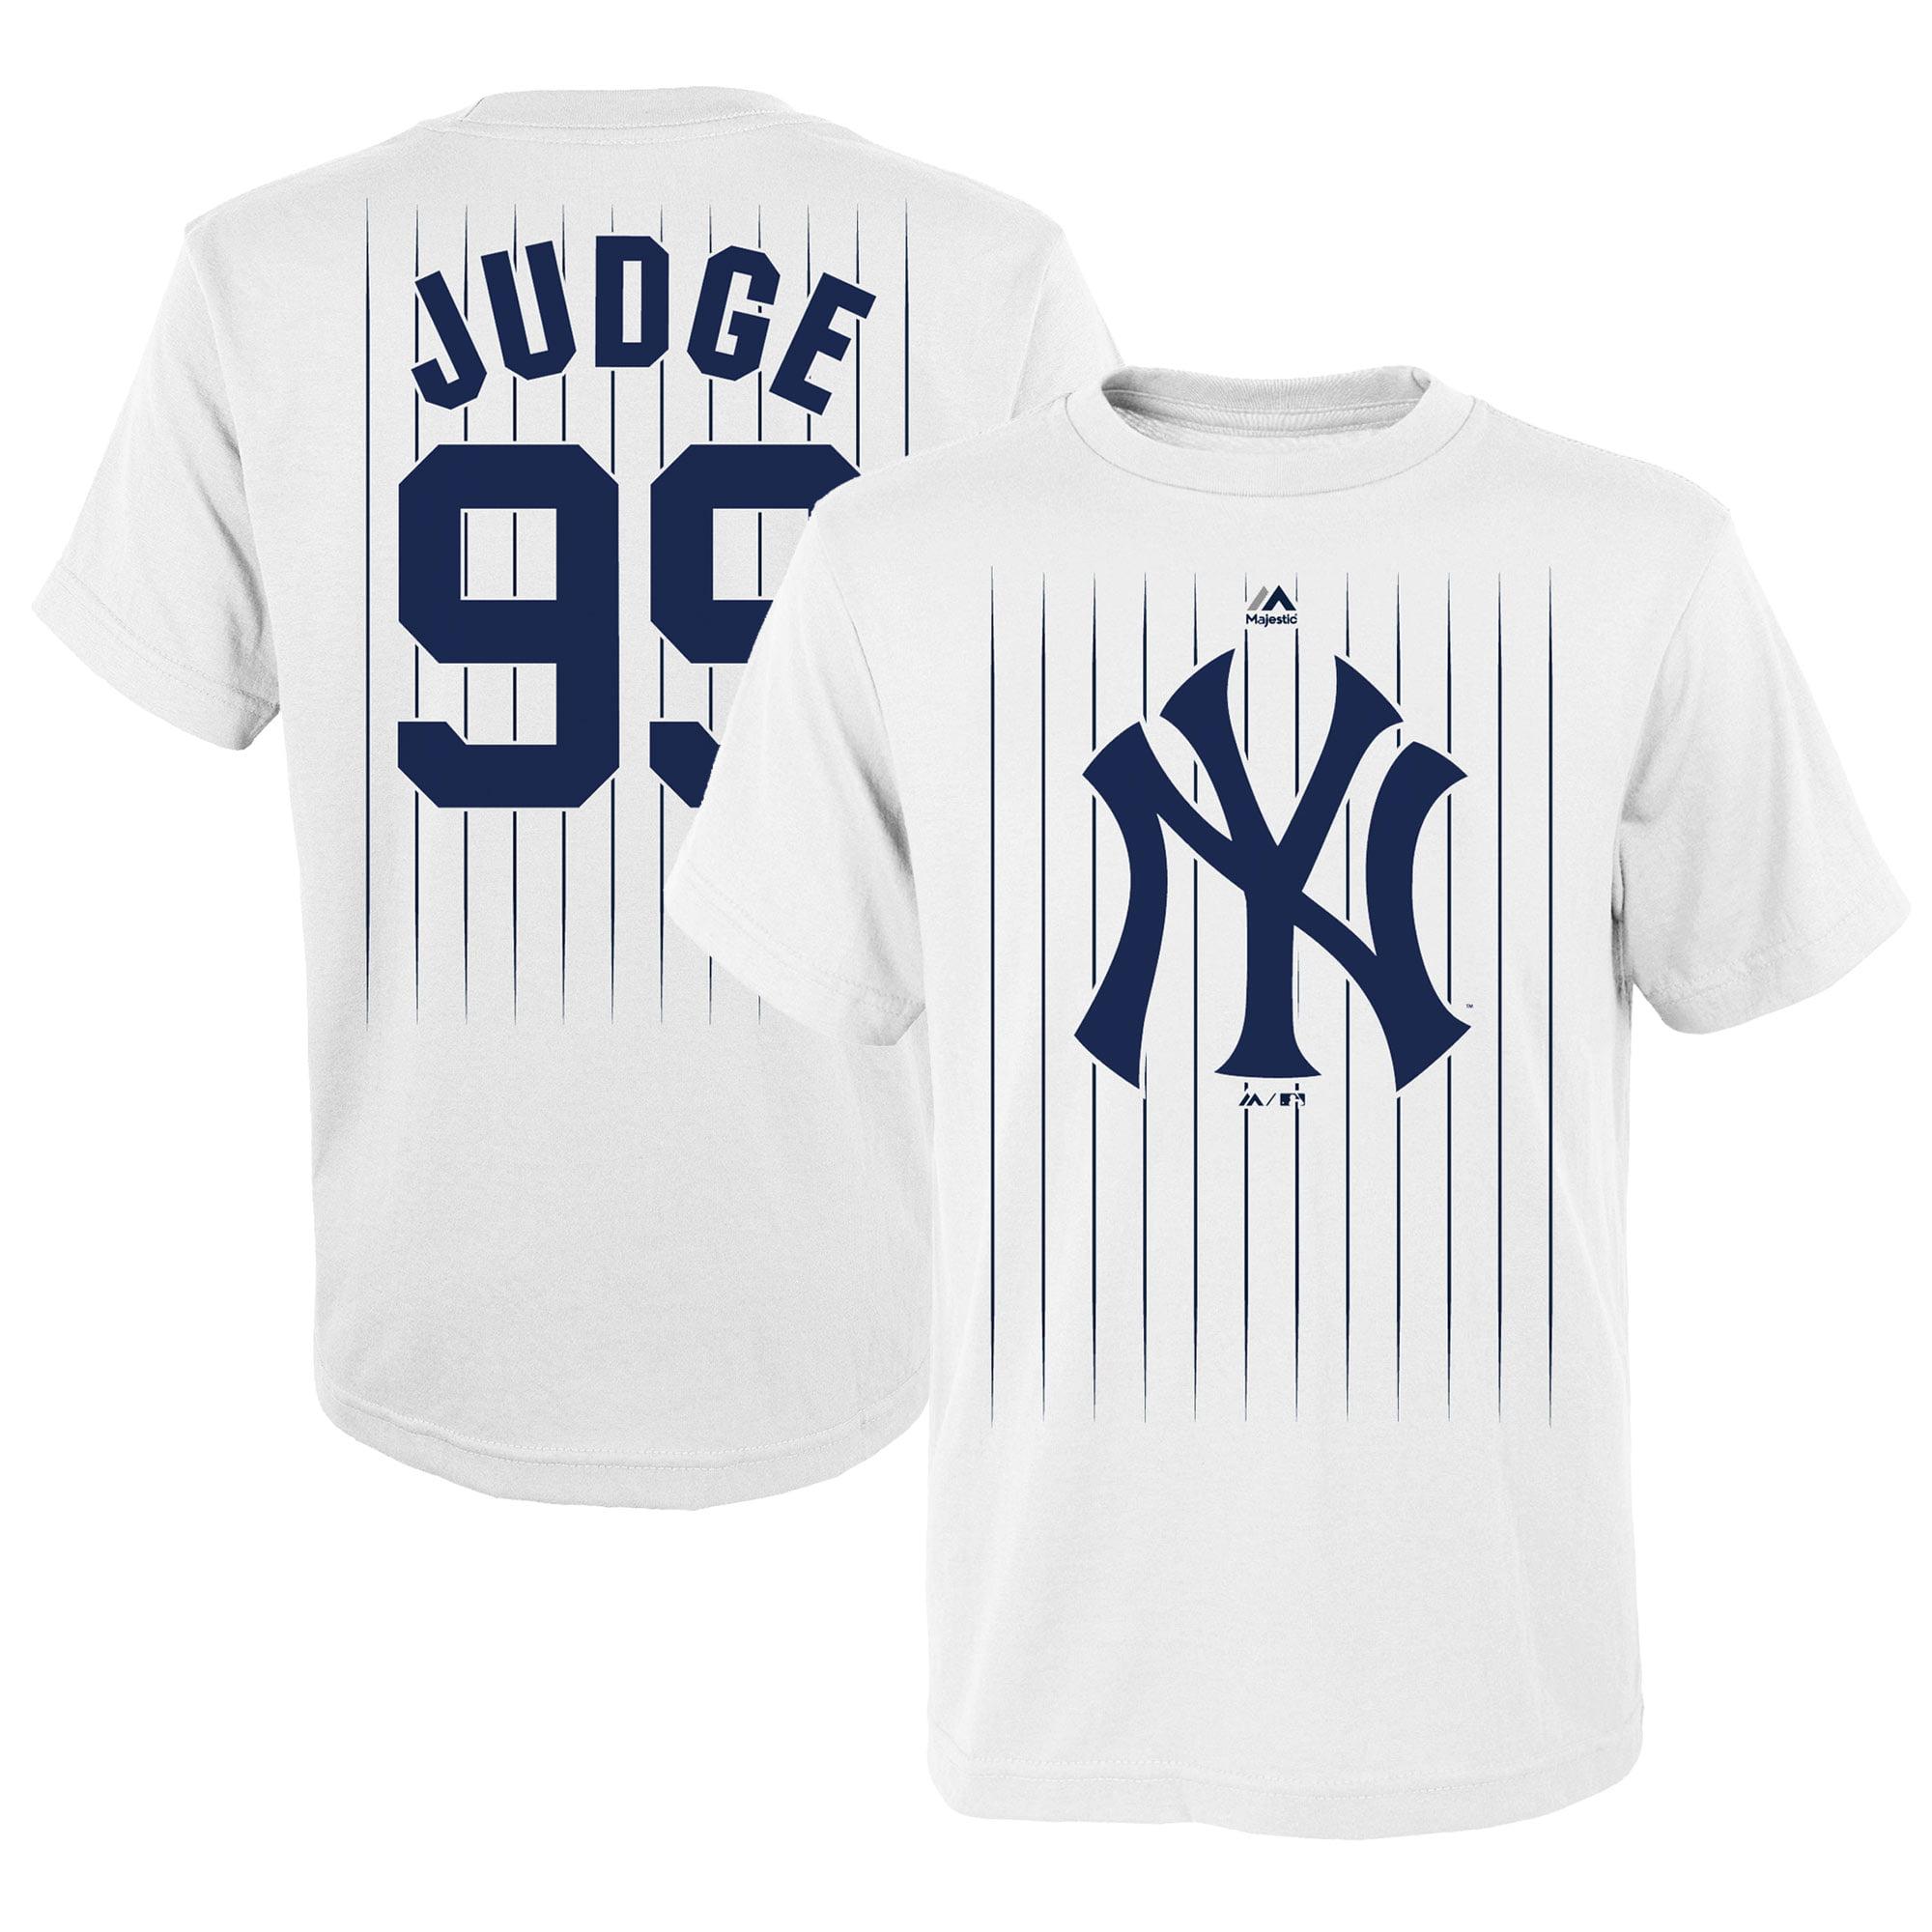 Aaron Judge New York Yankees Majestic Youth Graphic T-Shirt - White